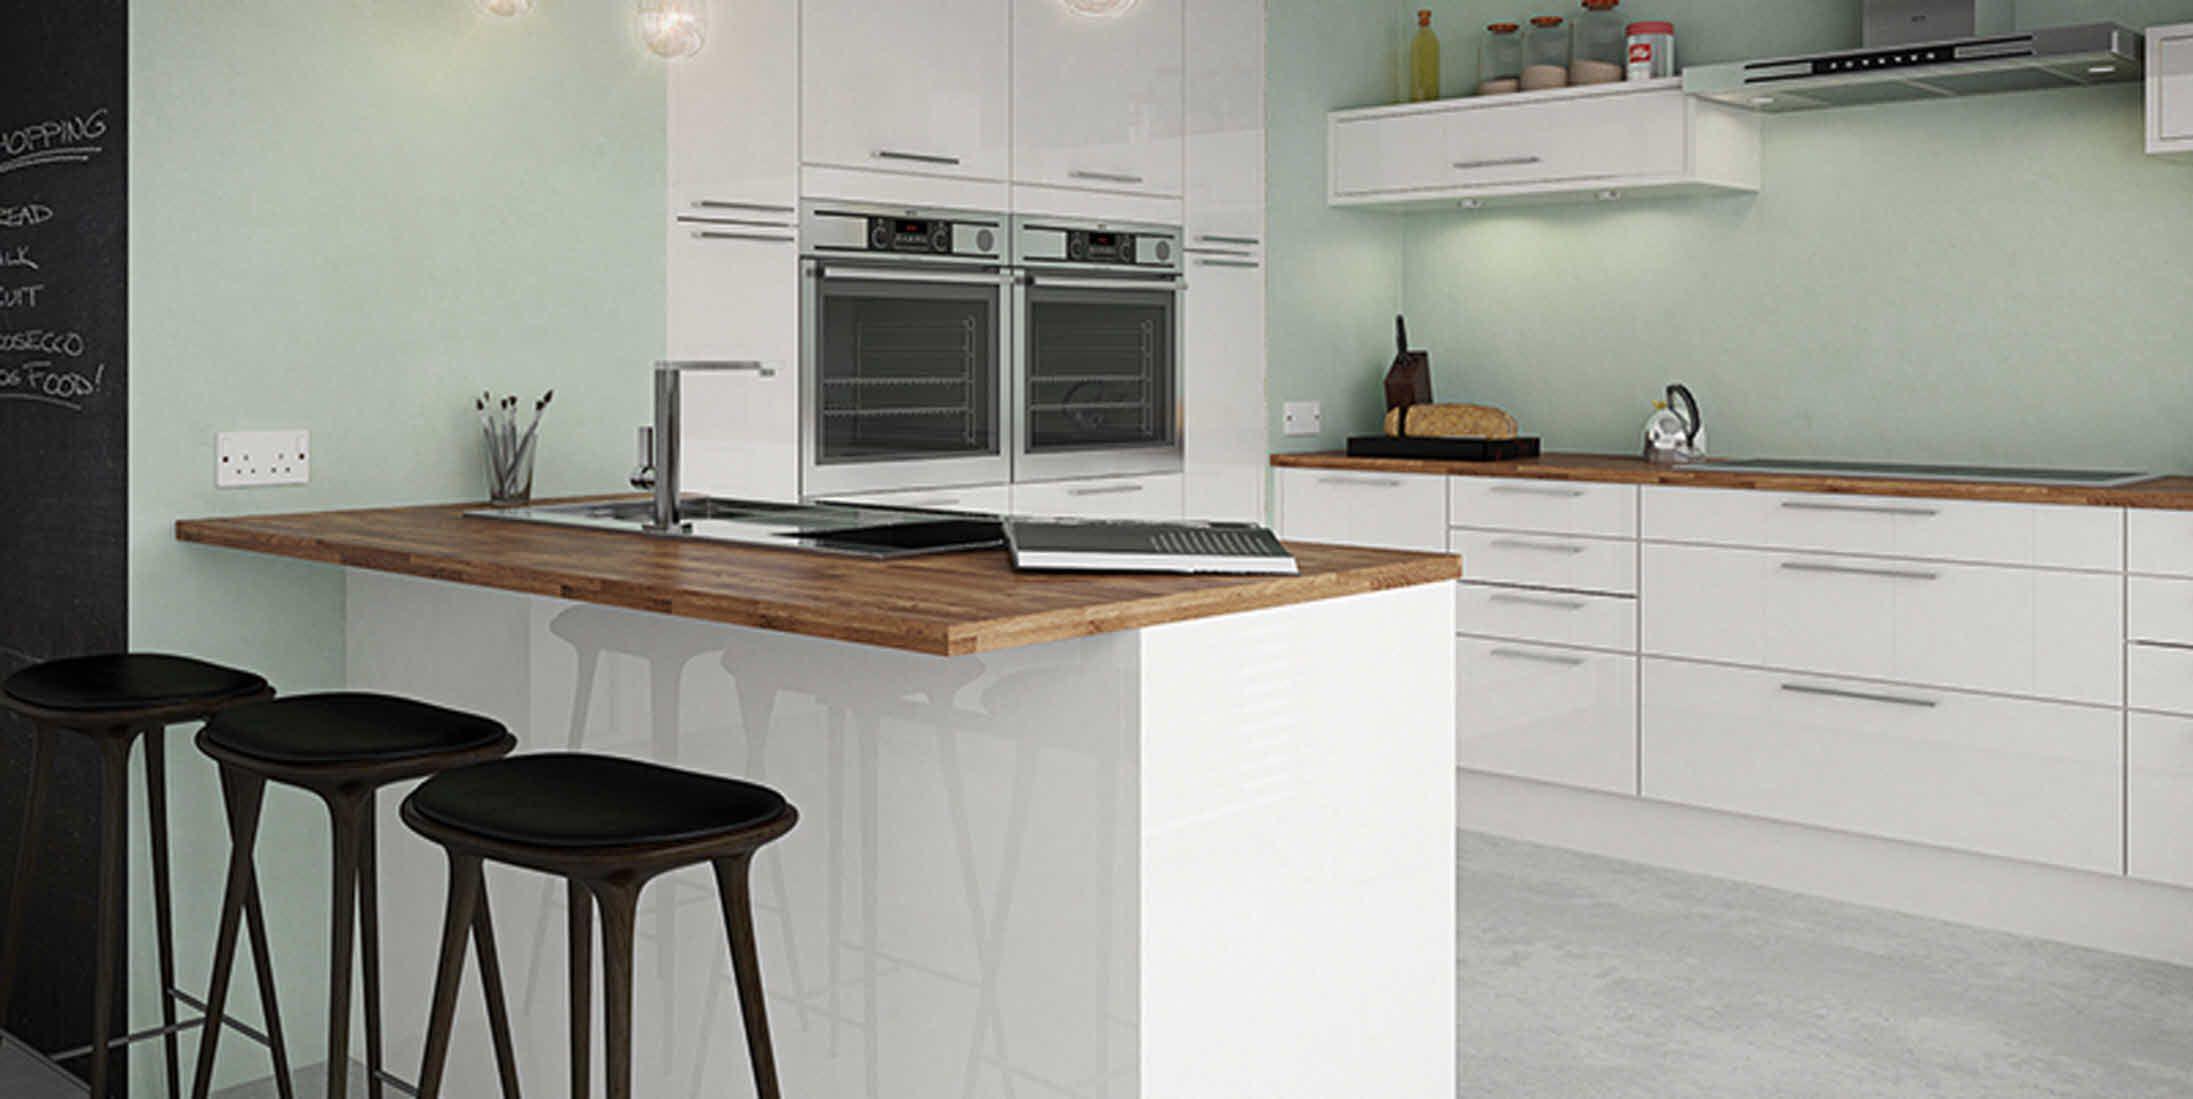 Magnet Kitchen Breakfast Bar Kitchen Kitchen Kitchen Tile Kitchen Paint